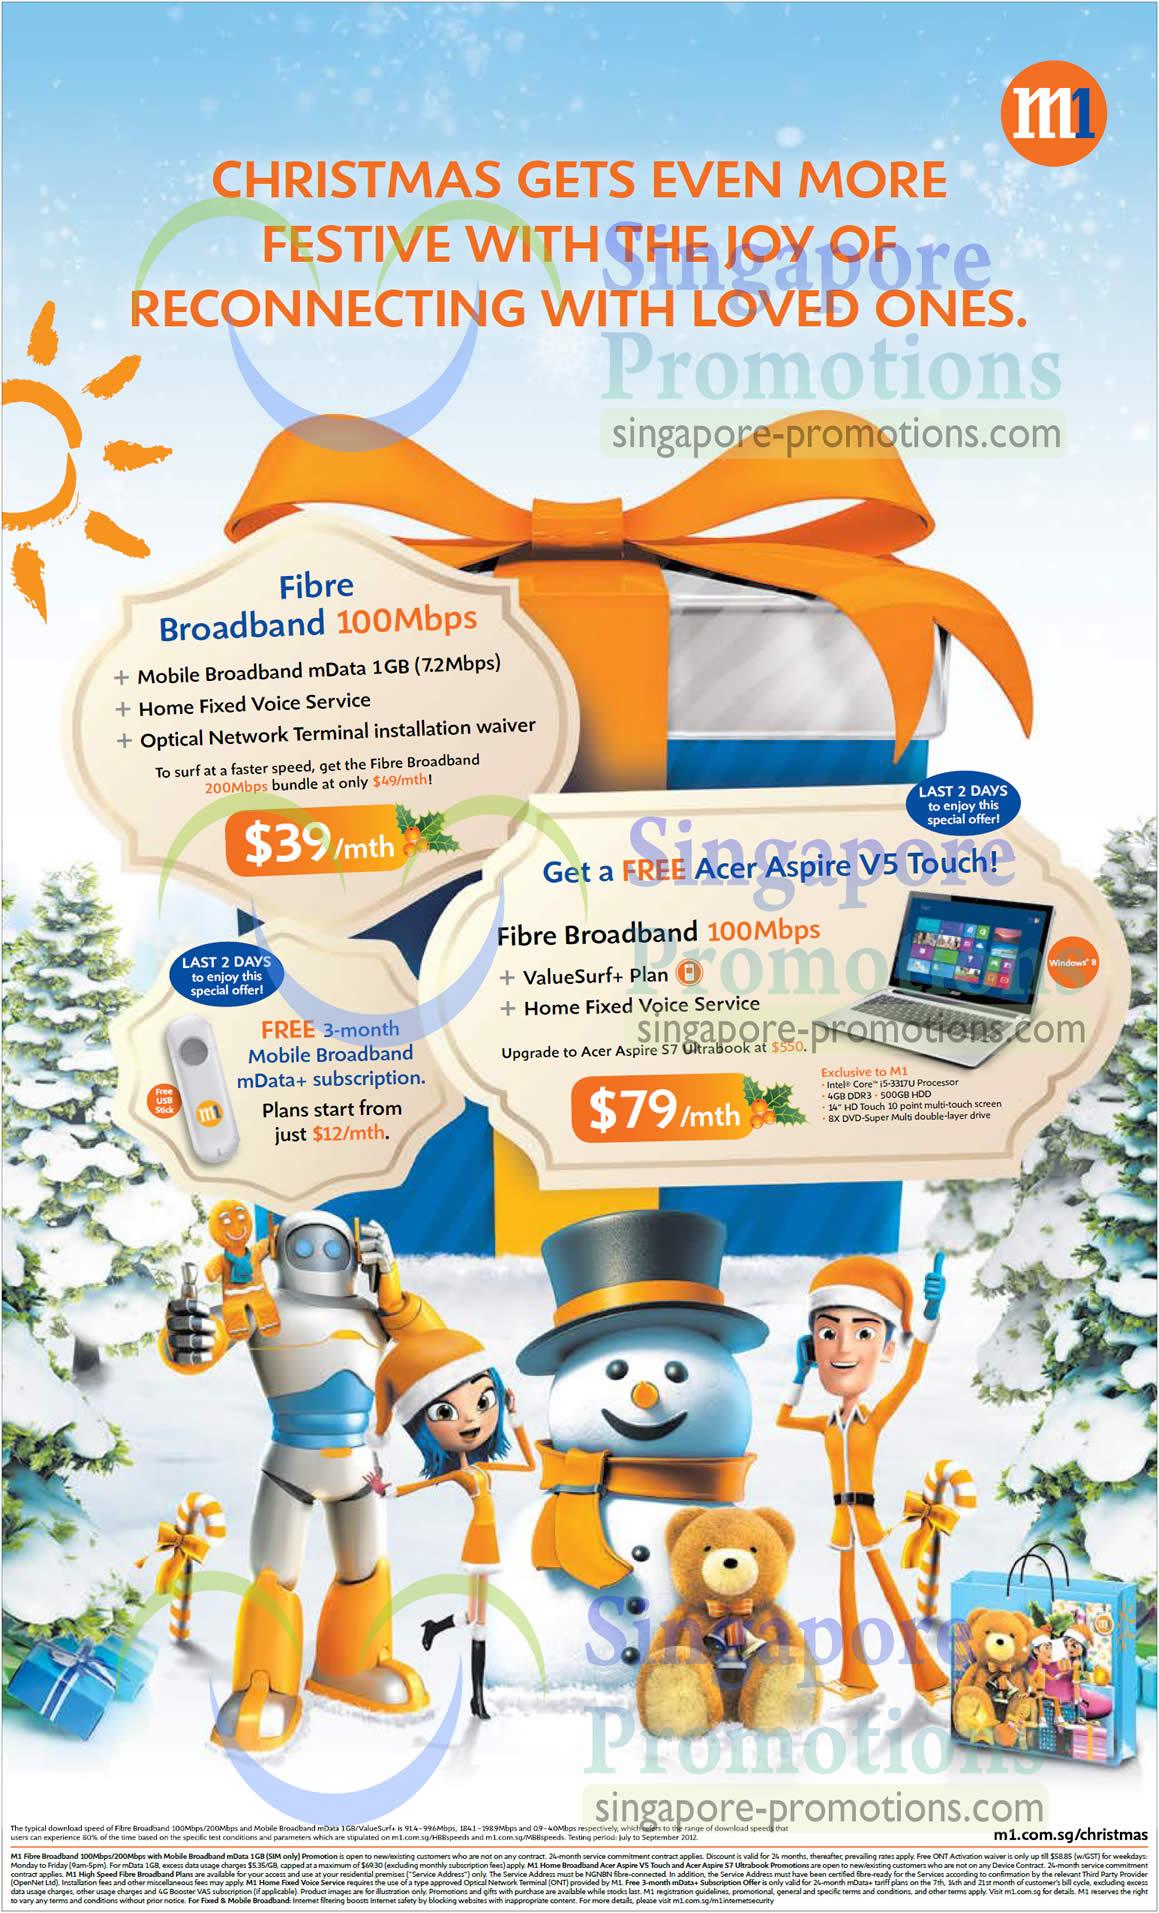 39.00 Fibre Broadband 100Mbps, Acer Aspire V5 Touch Notebook